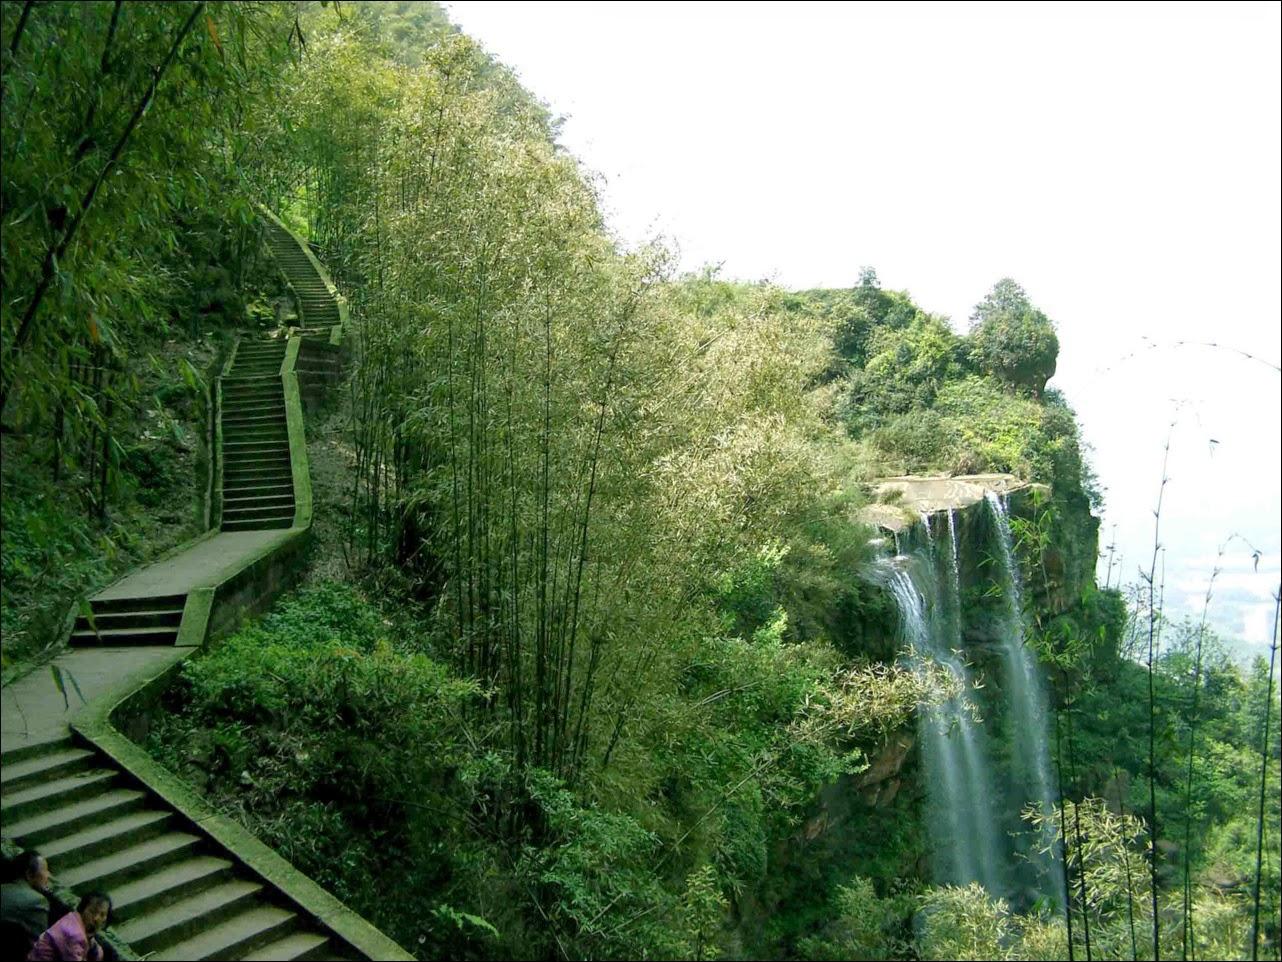 Shunan Bamboo Sea The Biggest Natural Bamboo Forest